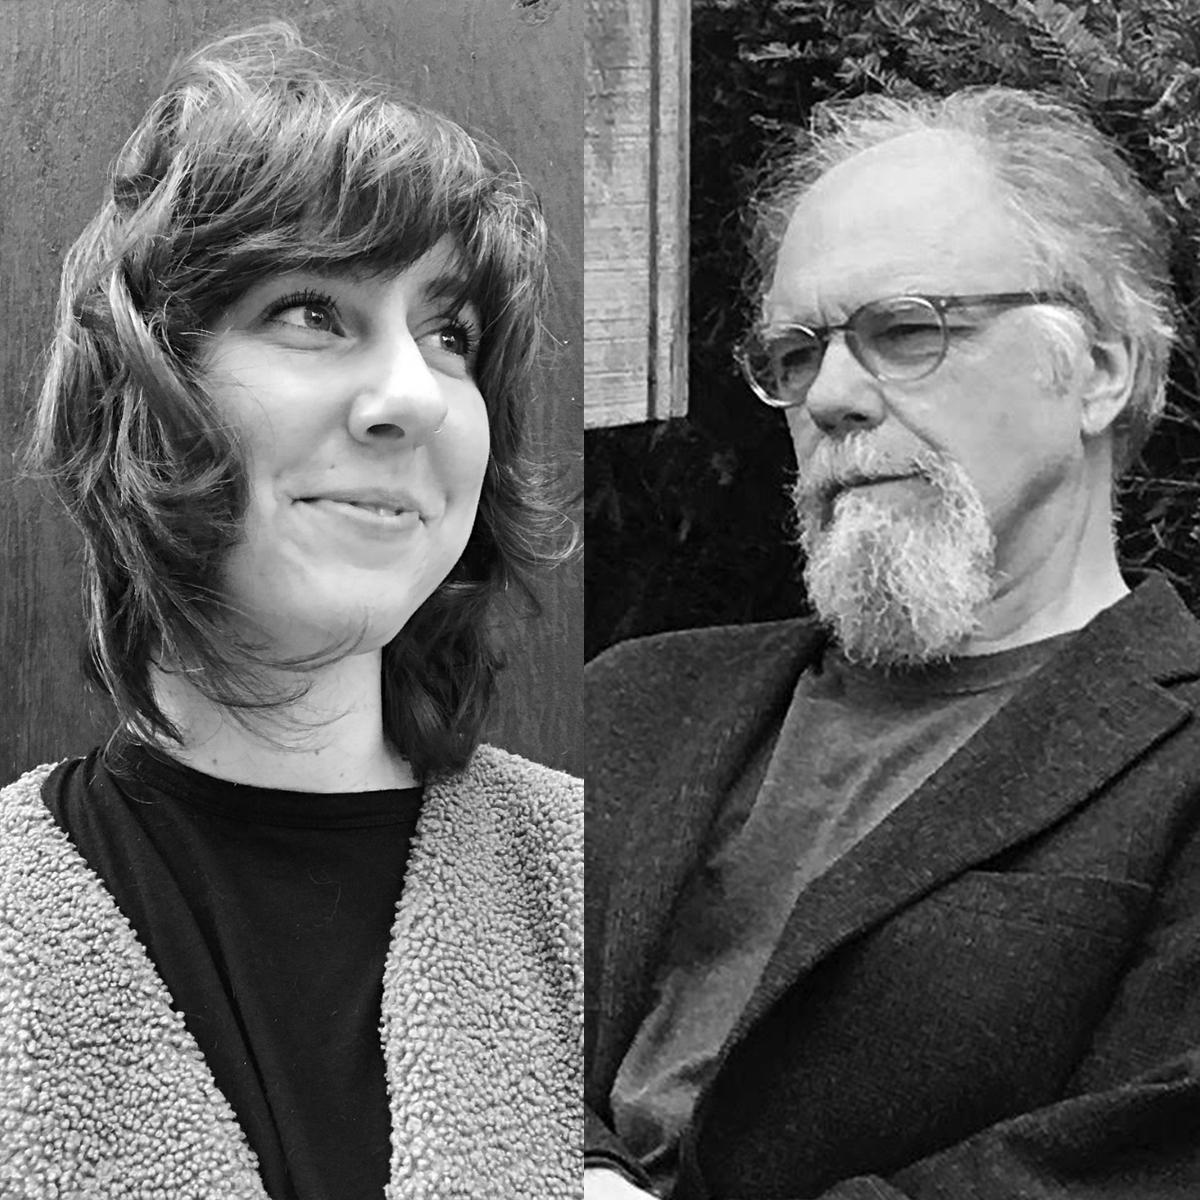 Mary Catherine Kinniburgh and Steve Clay